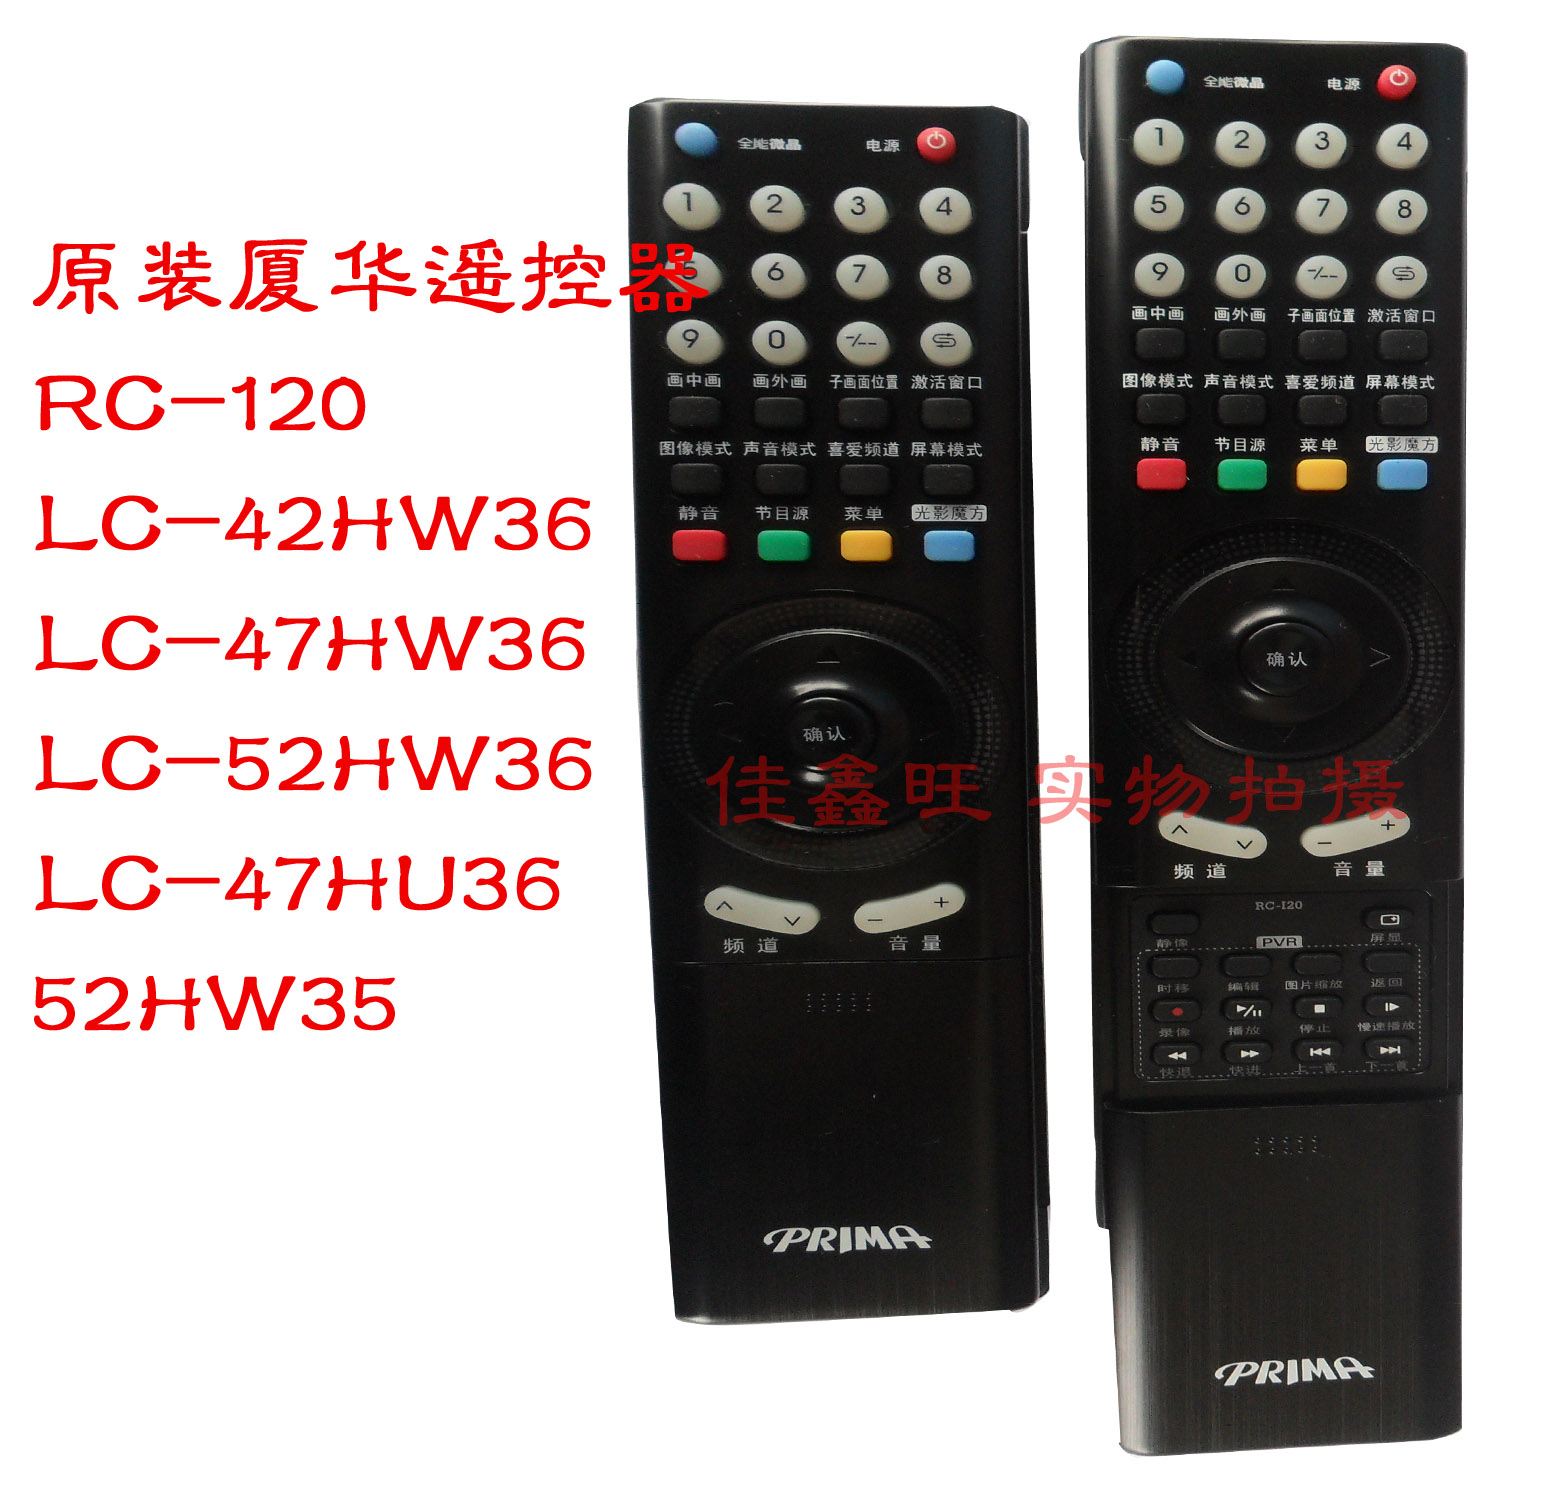 原厂夏华厦华遥控器RC-I20 RC-120(LC-42HW36\47HW36\52HW35)